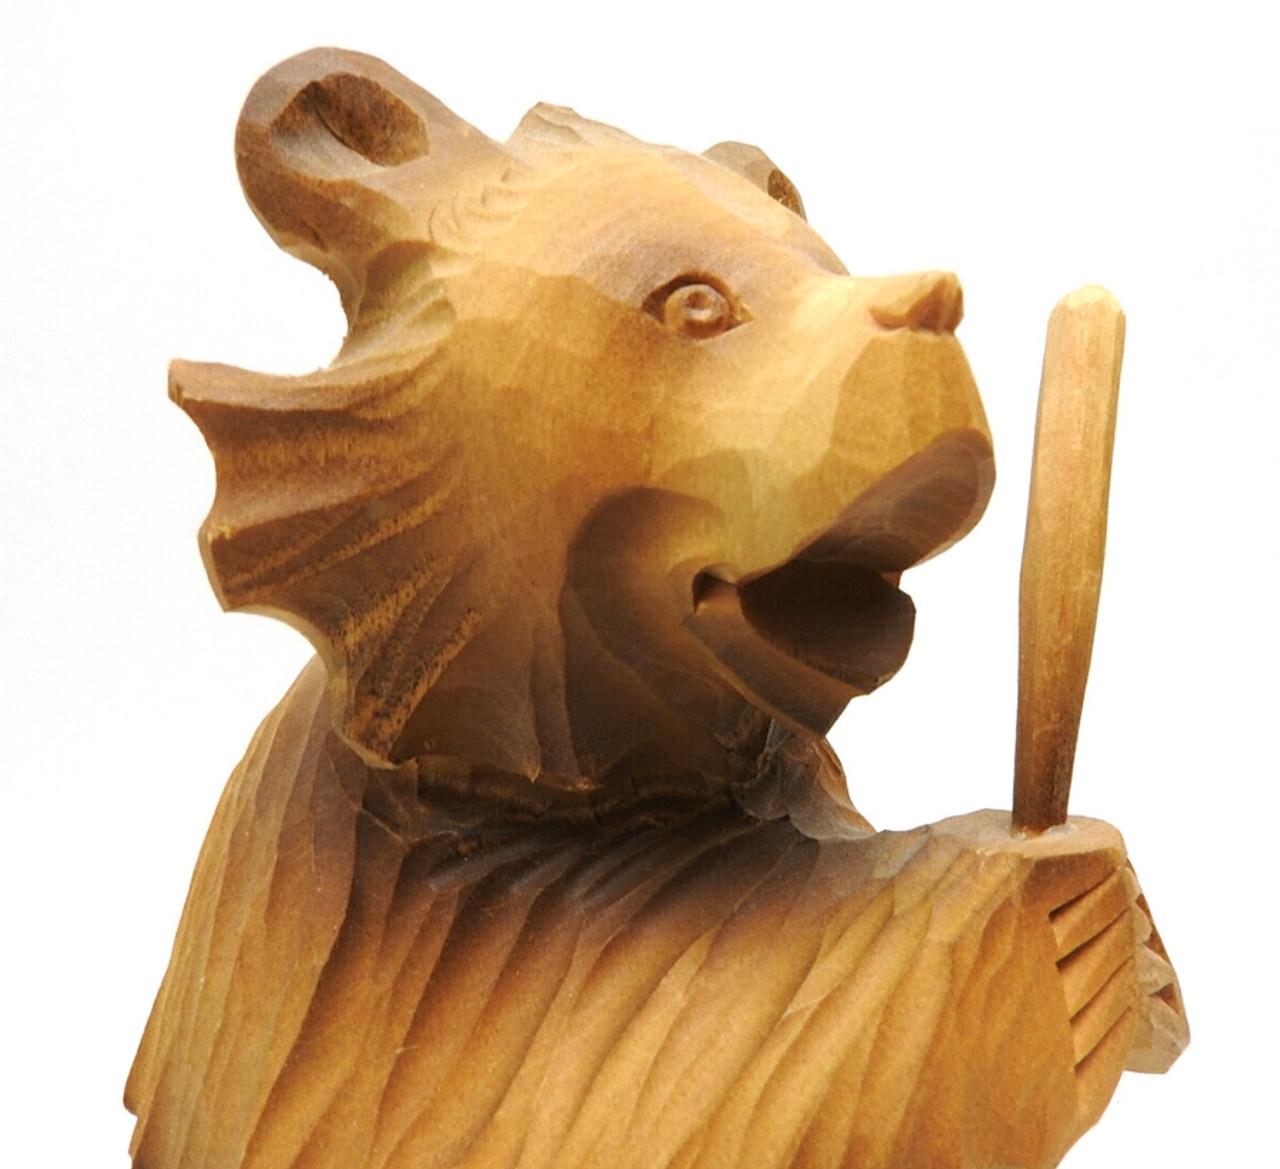 Bear with a Bat (Медведь с битой ) closer view